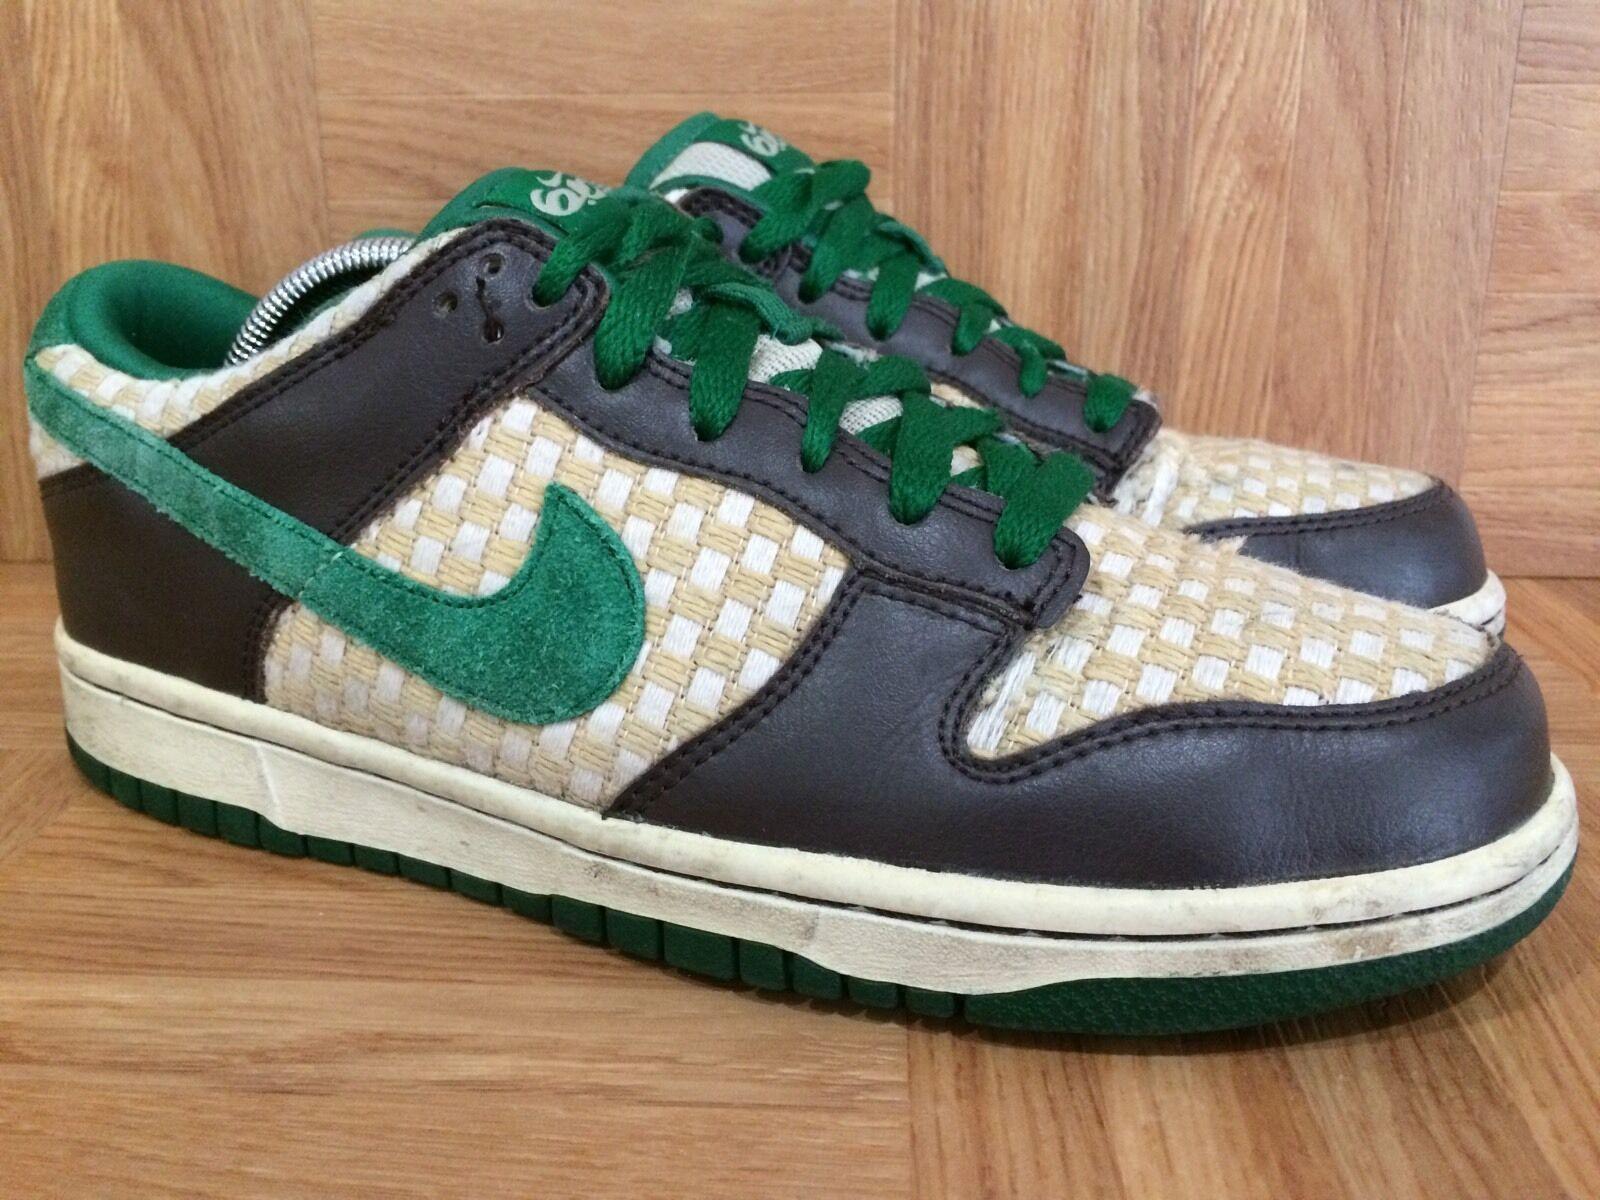 RARE  Nike Dunk Low 6.0 Overcast Pine Green Woven Sz 7.5 314142-331 Hemp Tweed